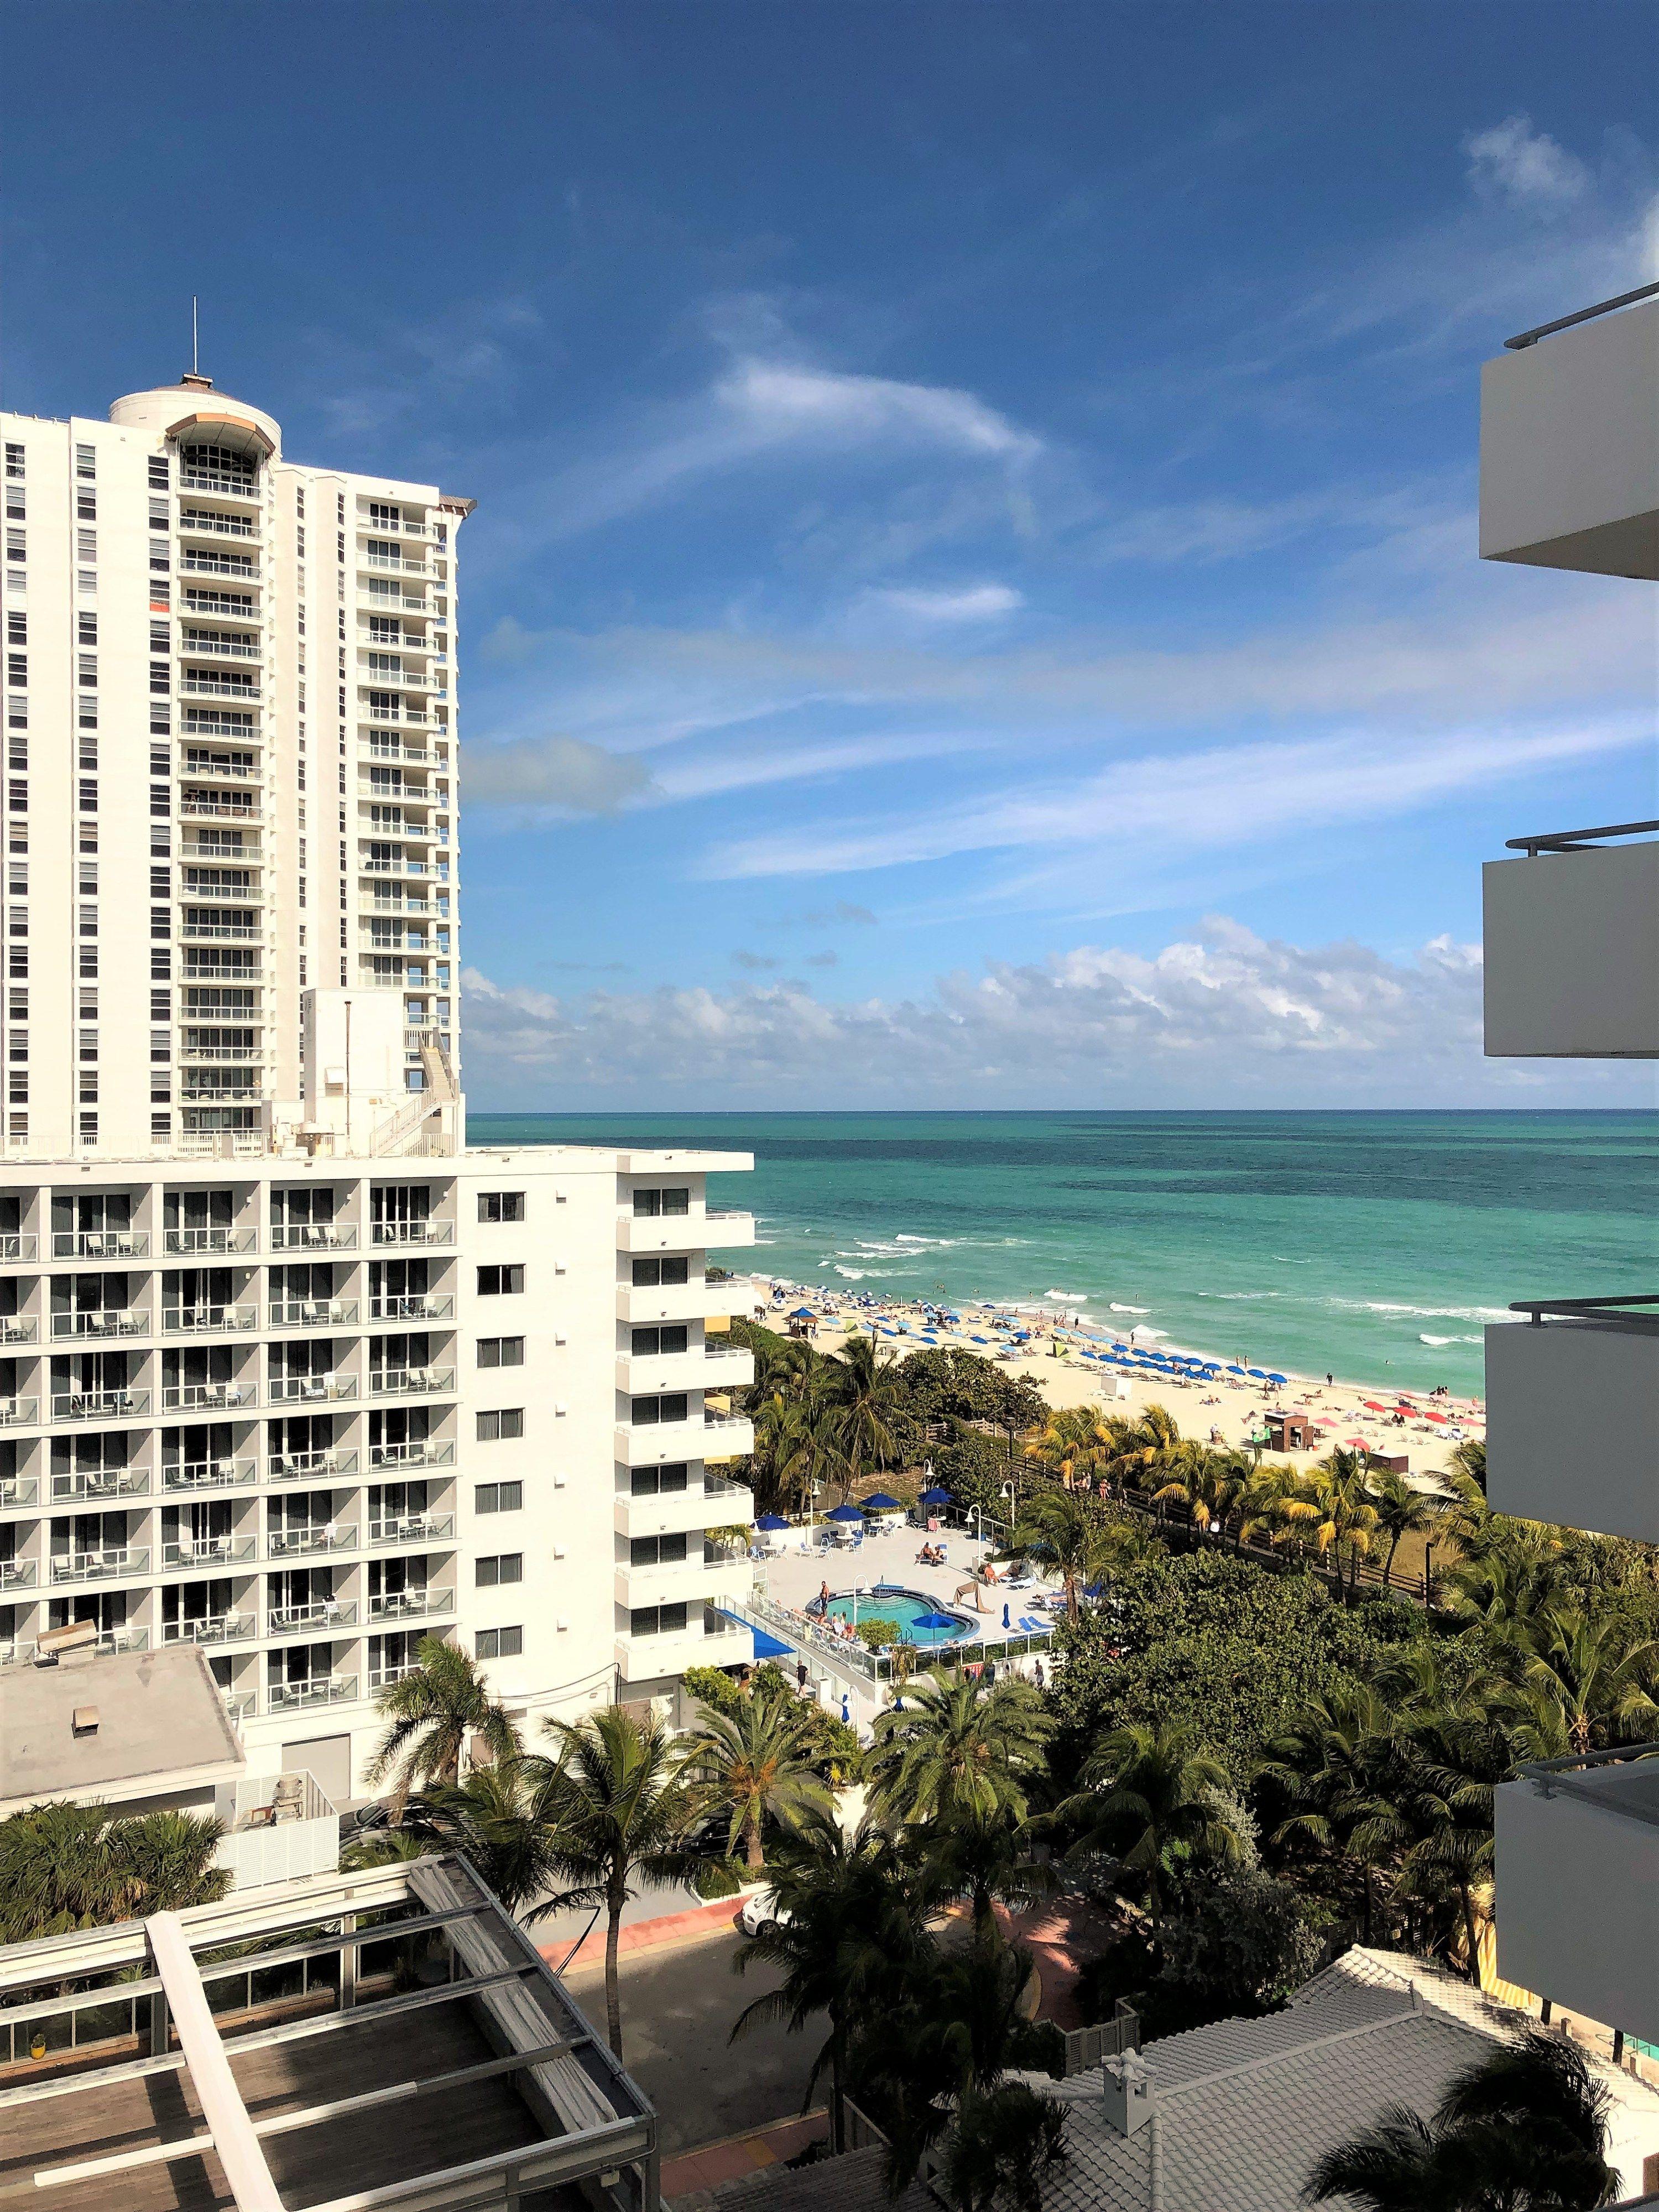 The Confidante Miami Beach: Our New Year's Eve Stay ...